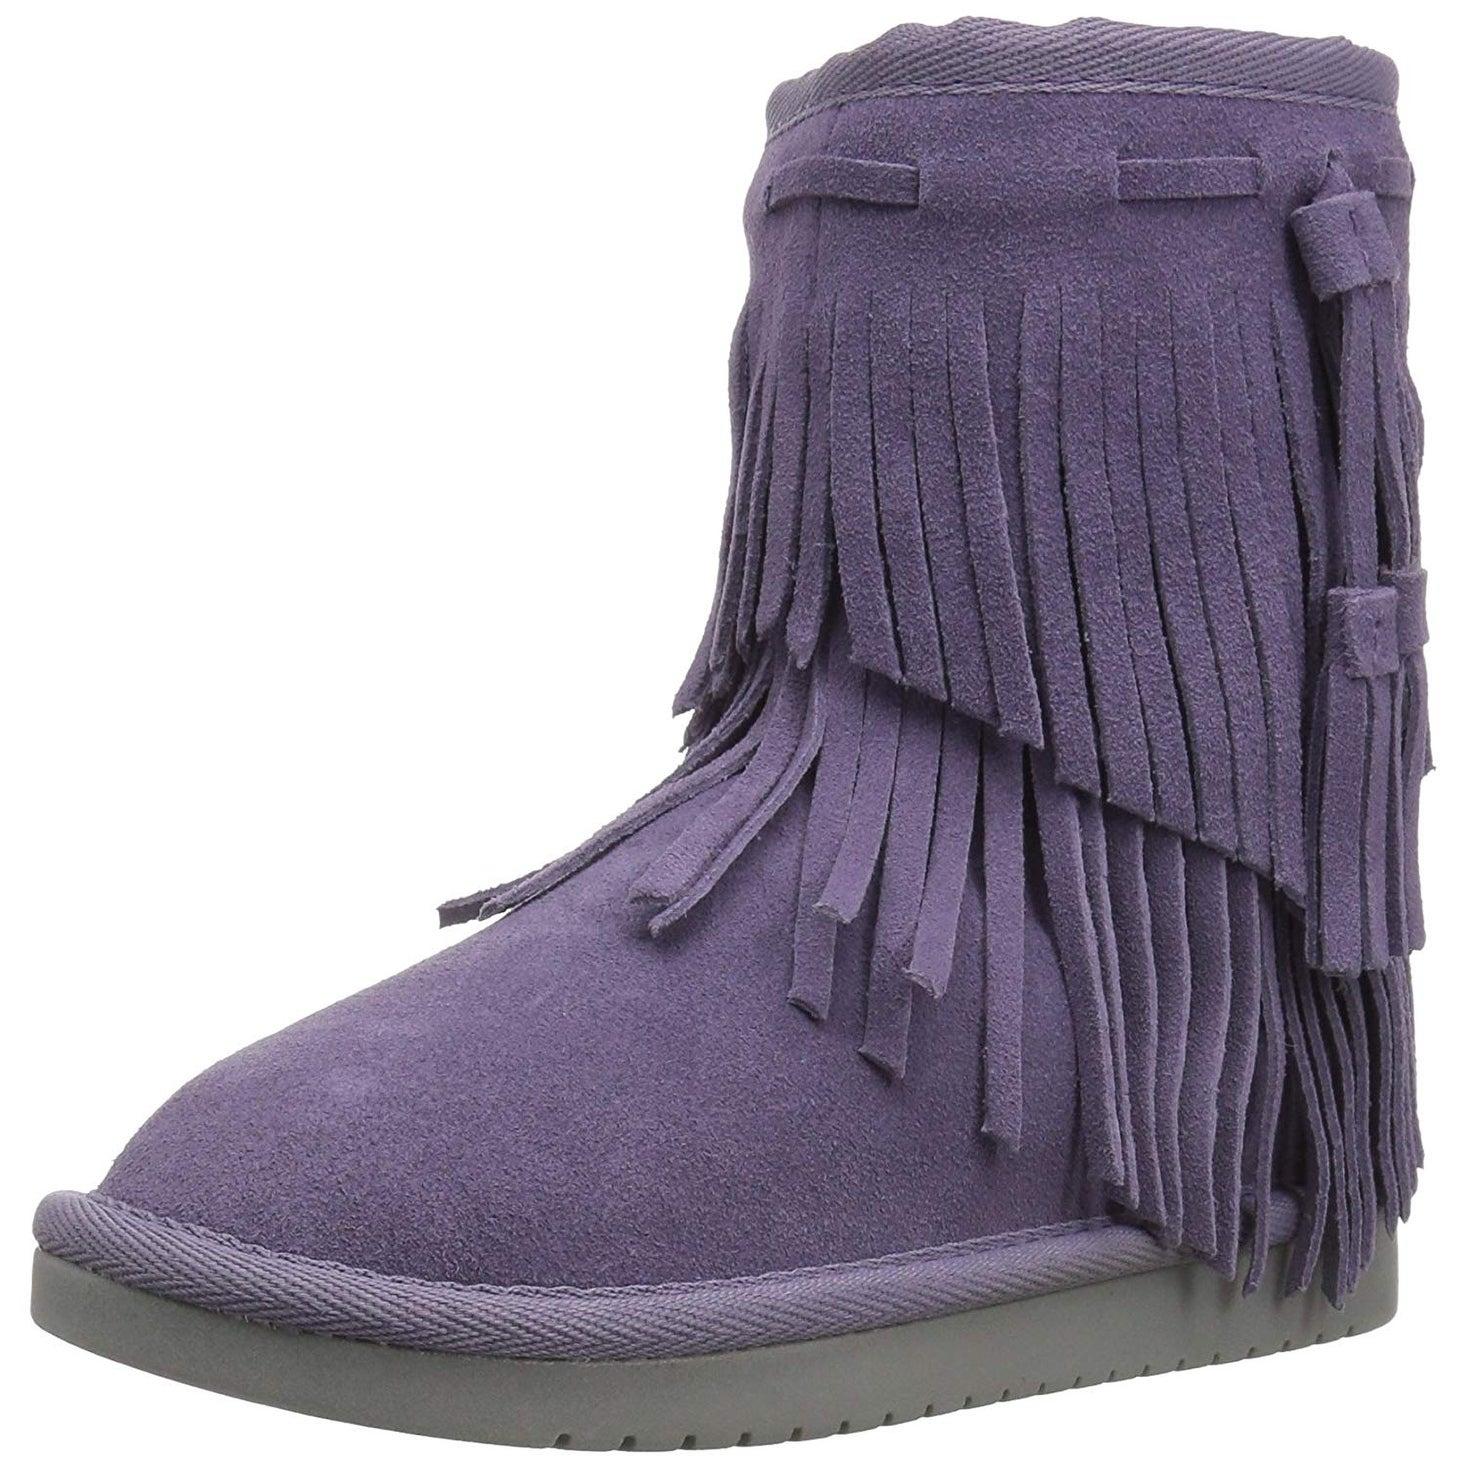 4f6f1567326 Koolaburra by UGG Girls' Cable Fashion Boot